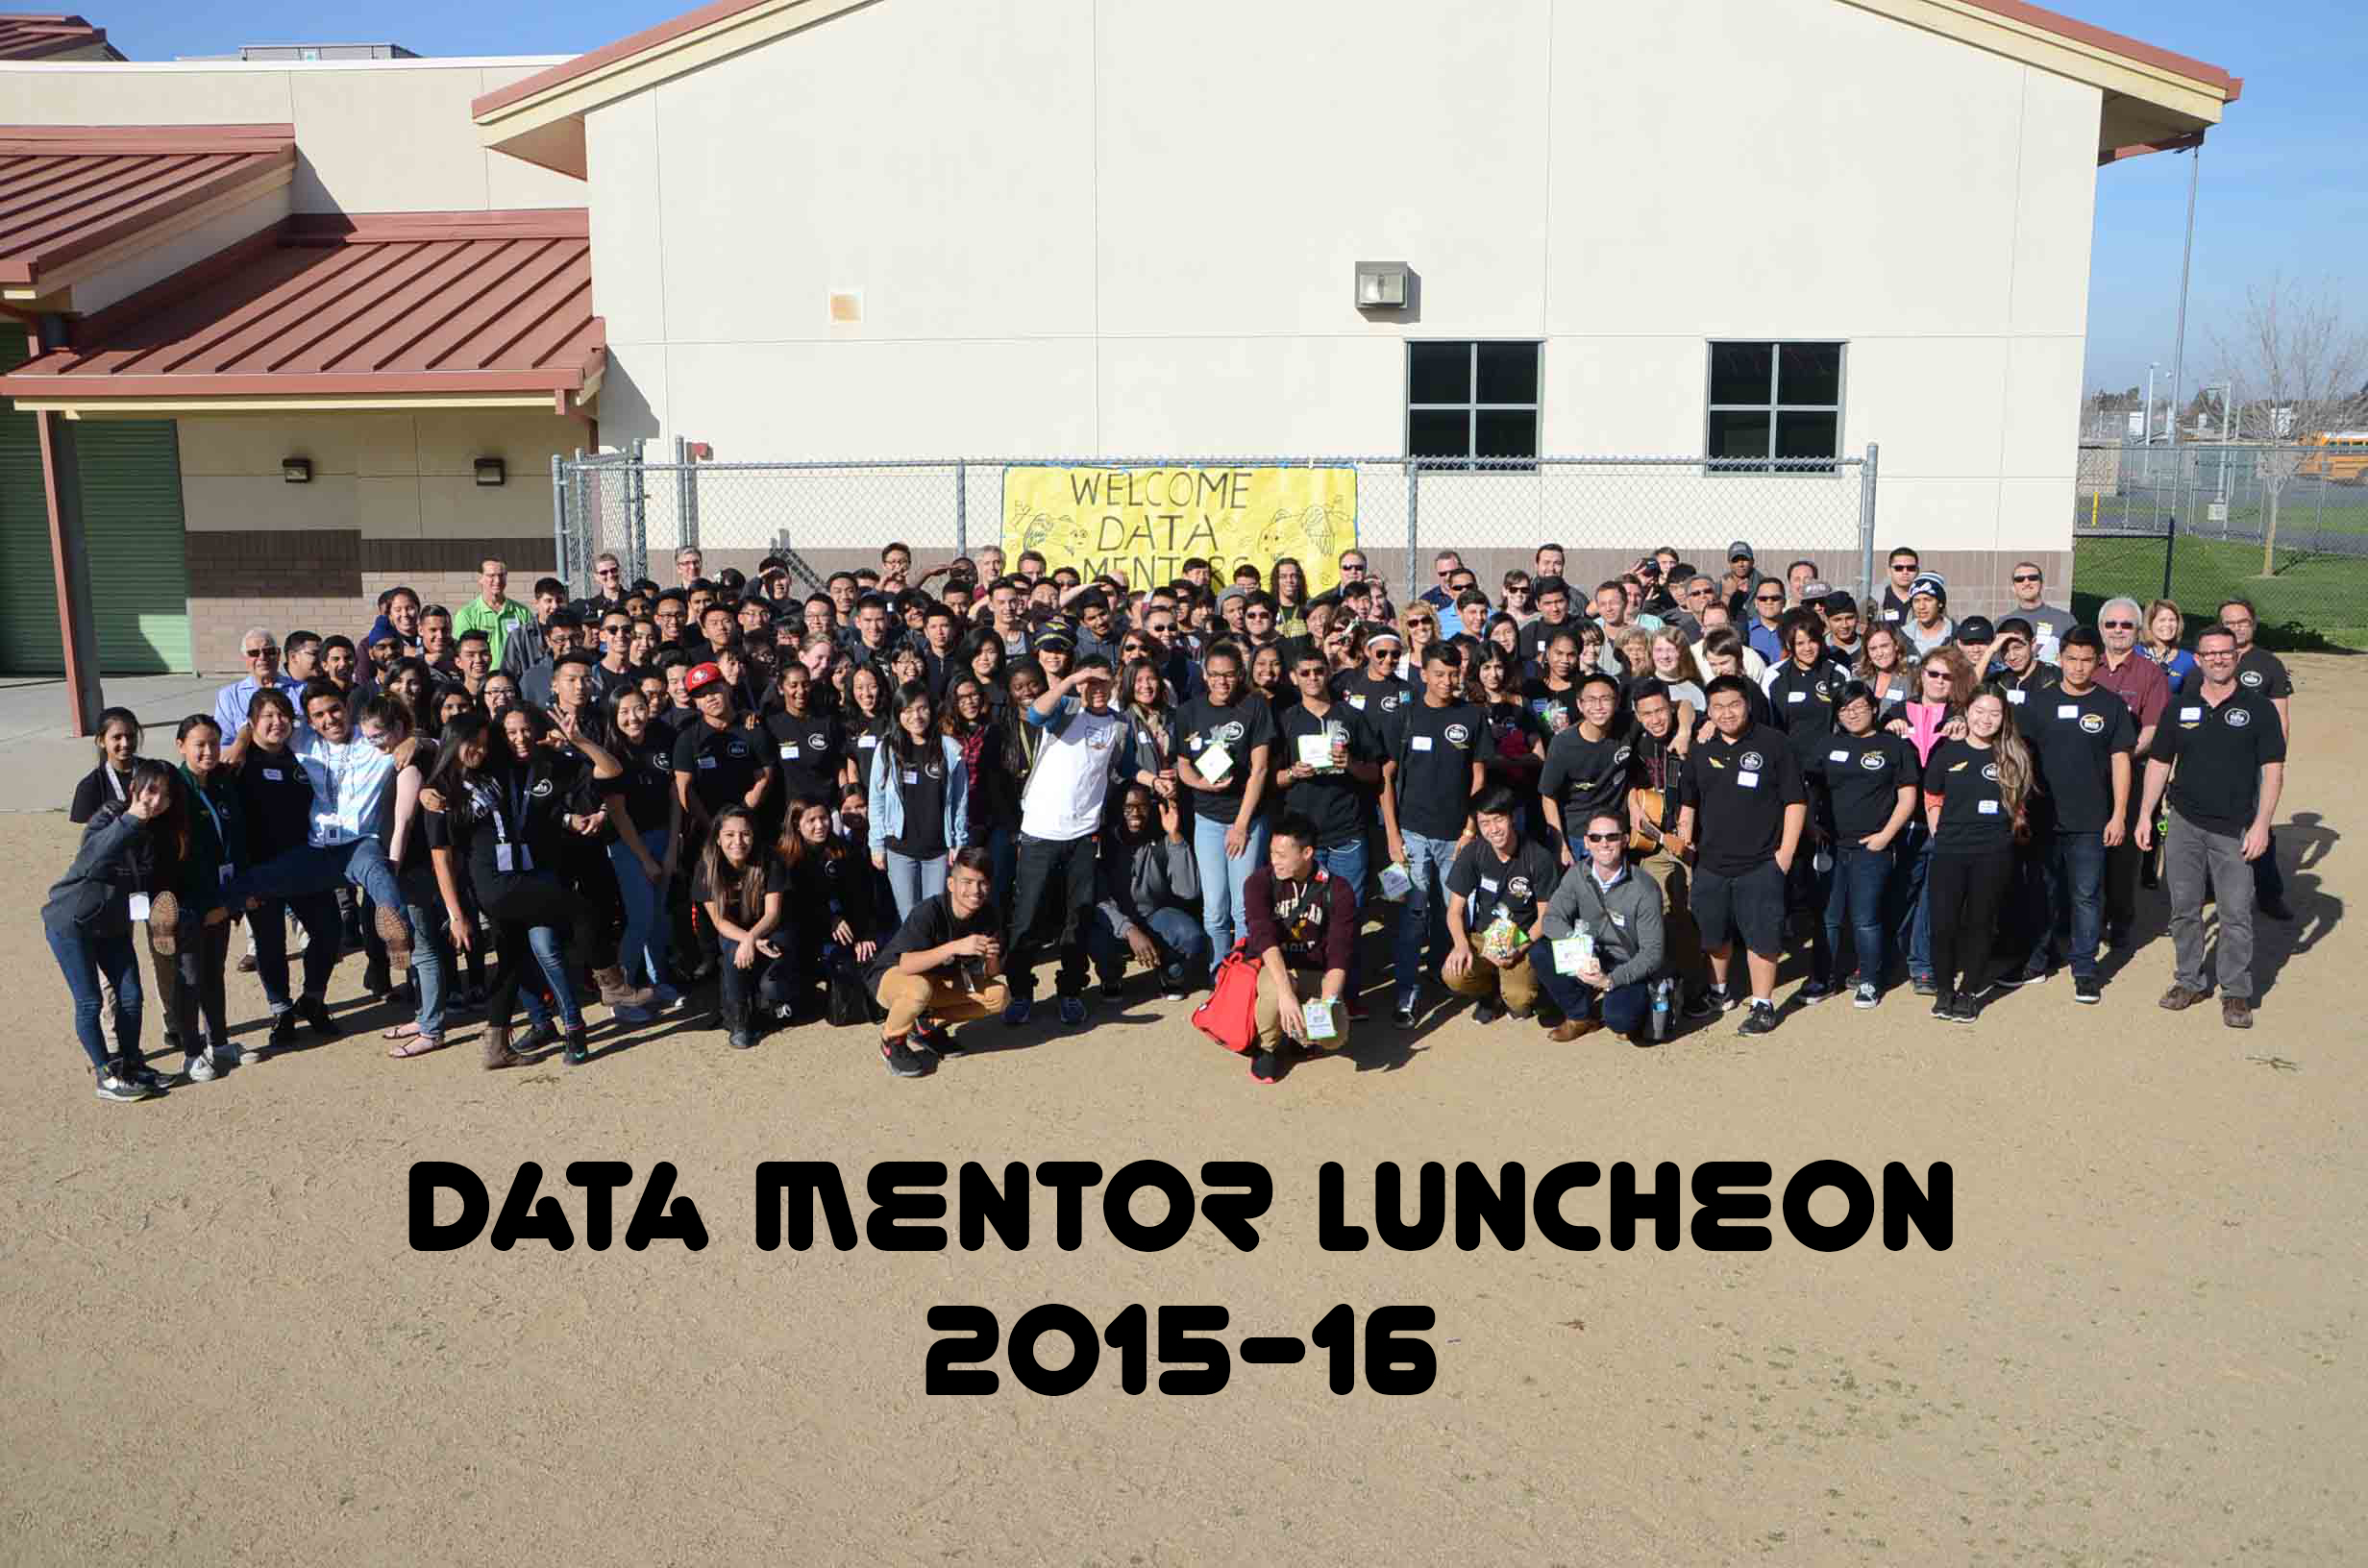 DATA Mentor Luncheon